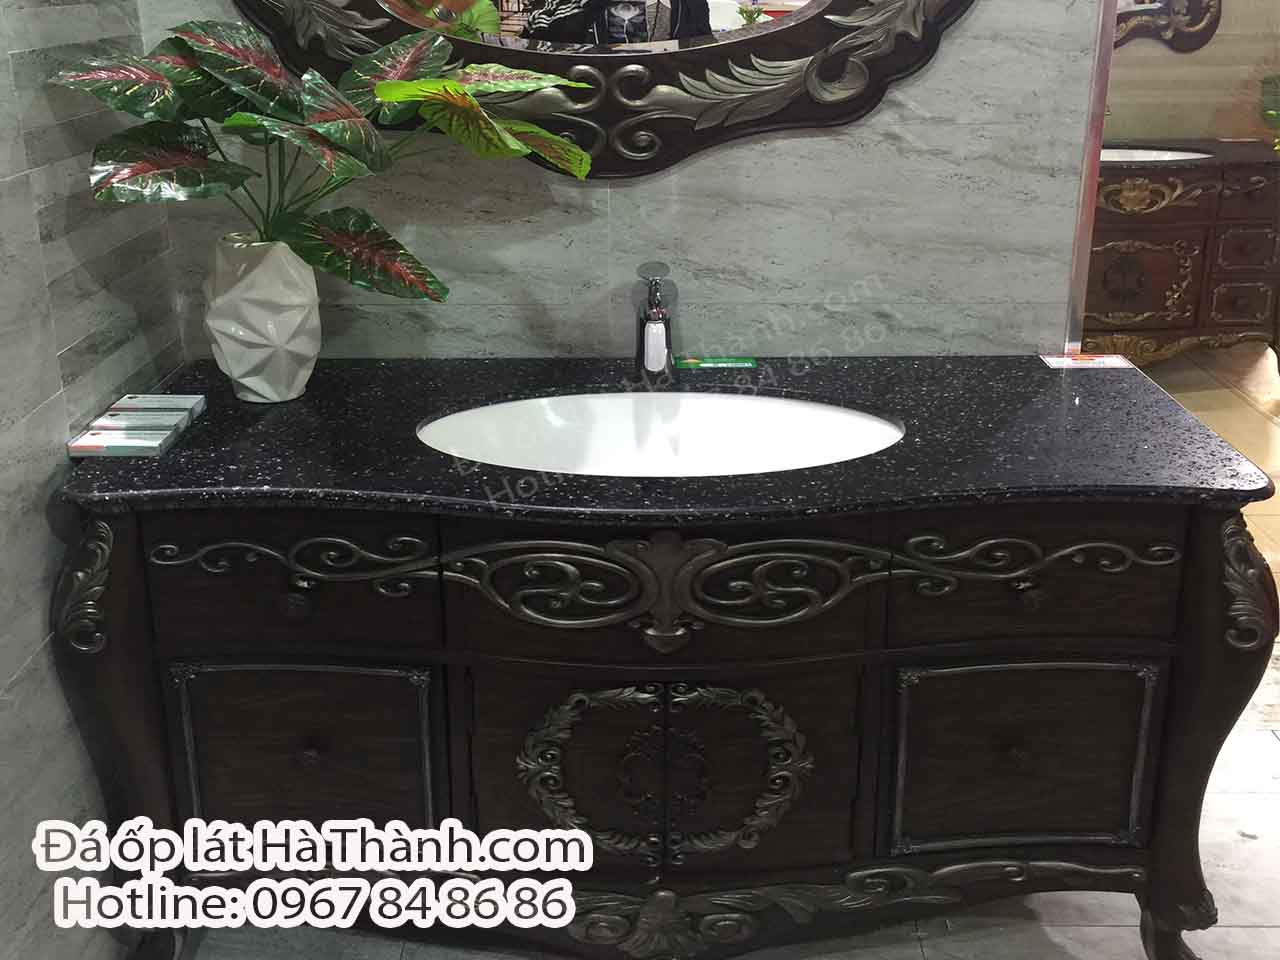 da-nhan-tao-empirestone-op-lavabo